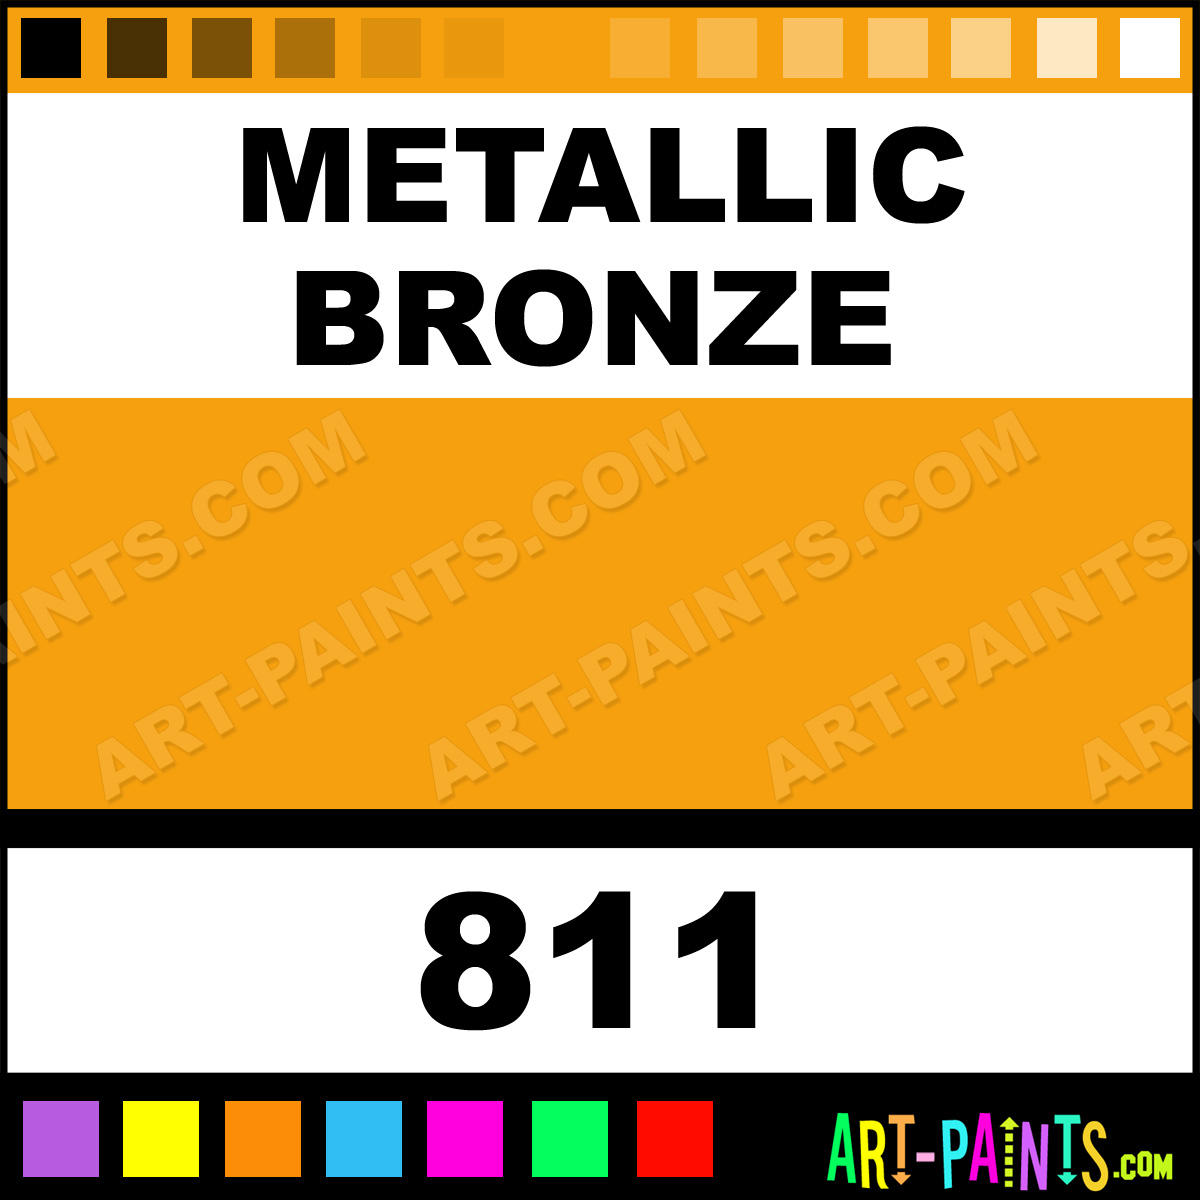 Metallic Bronze Extra Fine Gouache Calligraphy Ink Paints